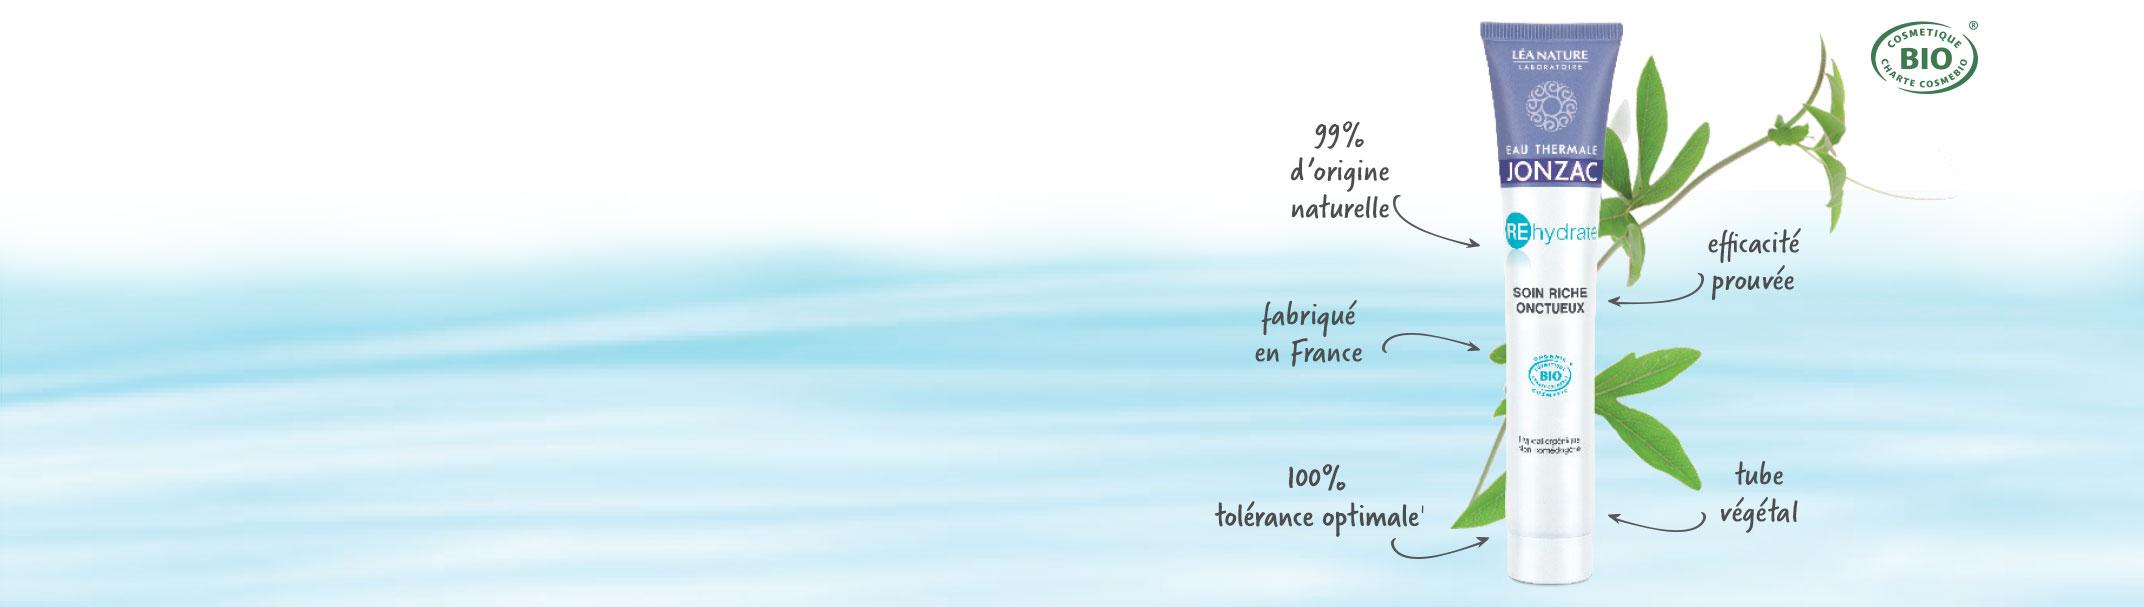 slide-cosmetique-bio-engagee-tolerance-optimale